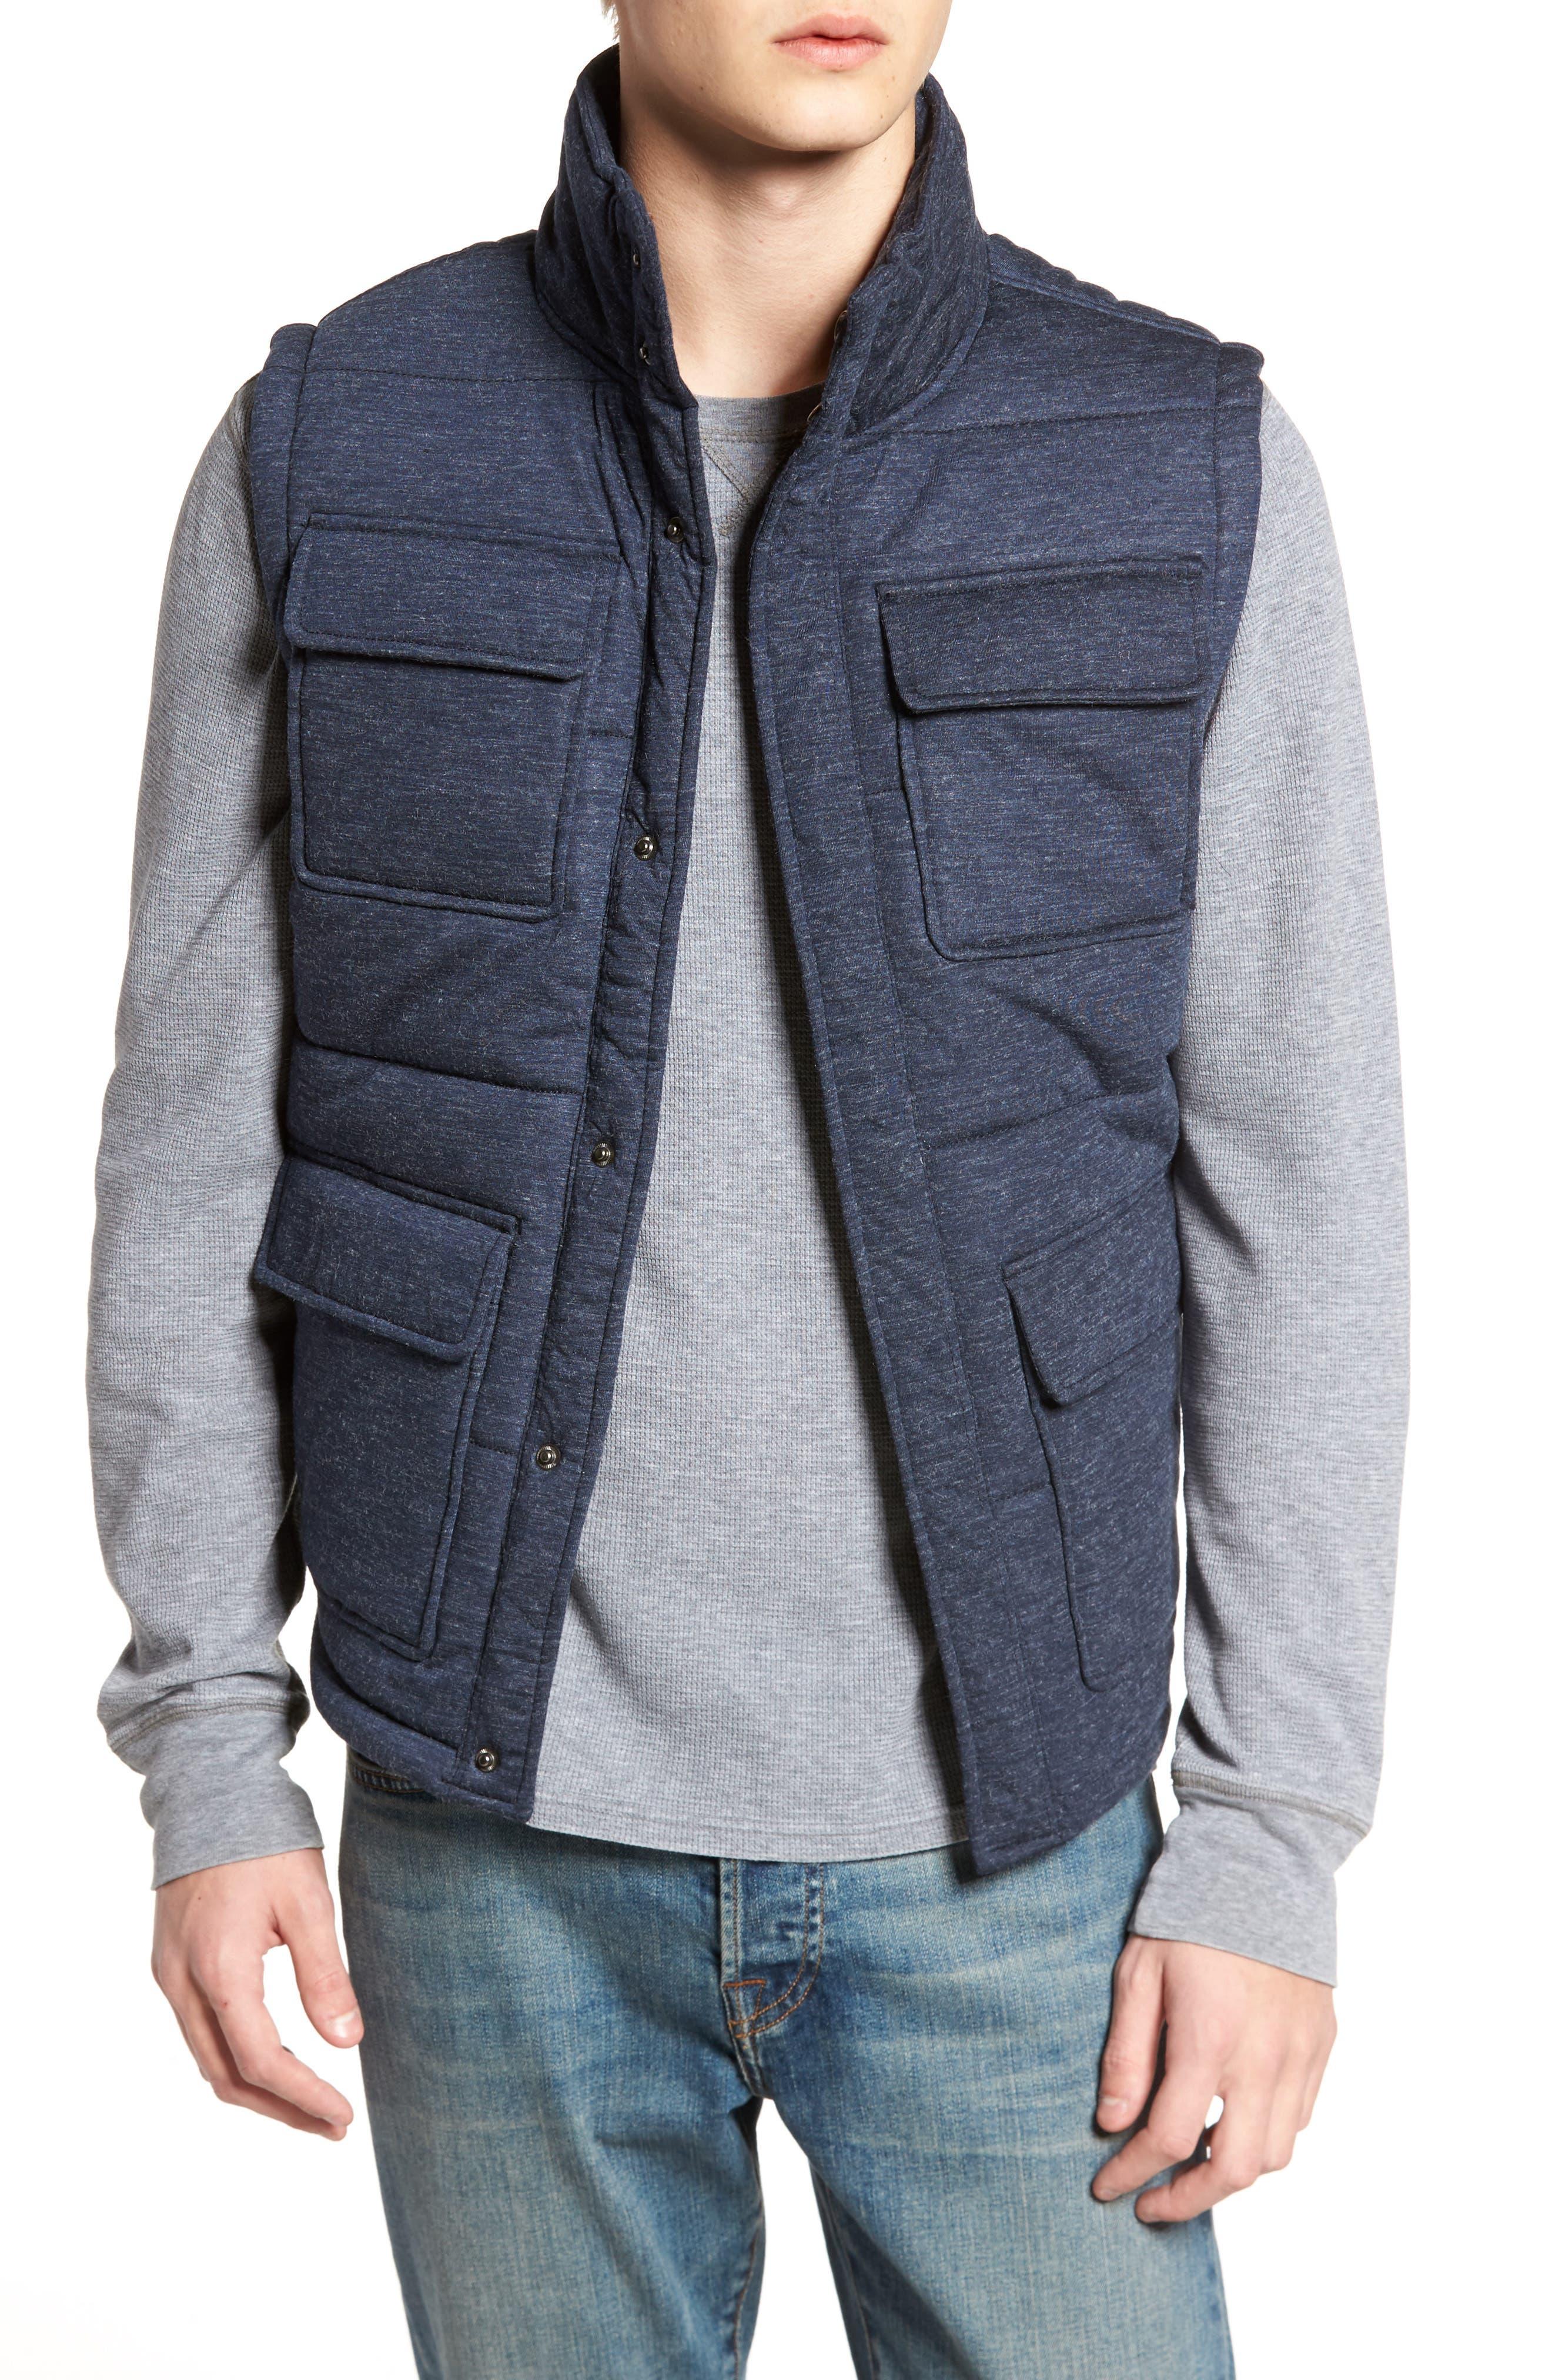 Four-Pocket Vest,                         Main,                         color, Navy